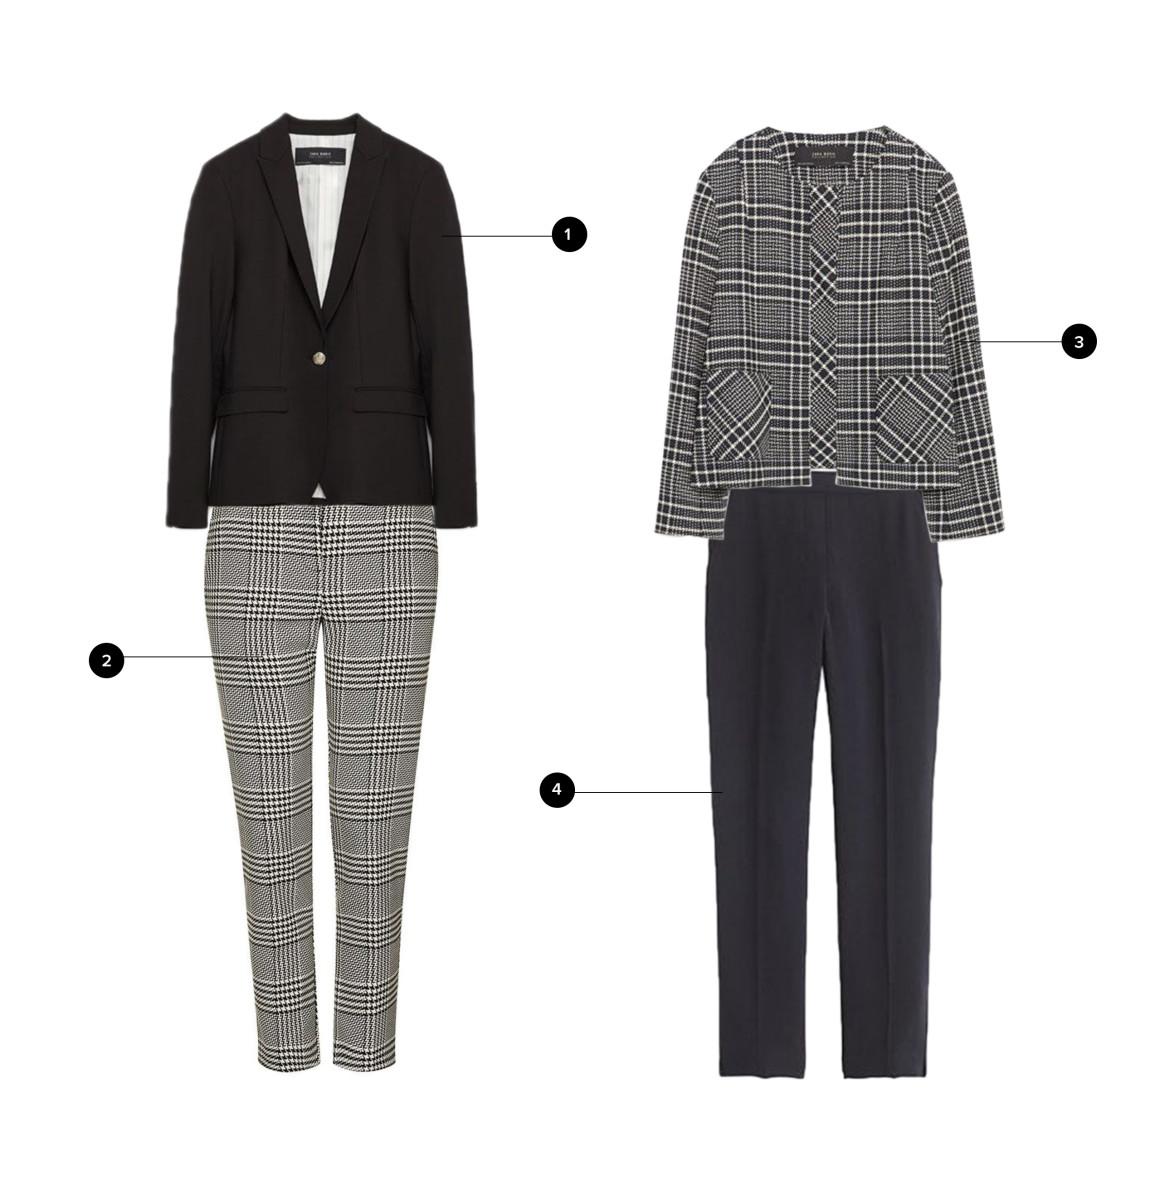 1. Zara, $70 / 2. Stylebop, $137(similar)/ 3. Zara, $100 / 4. J.Crew, $110